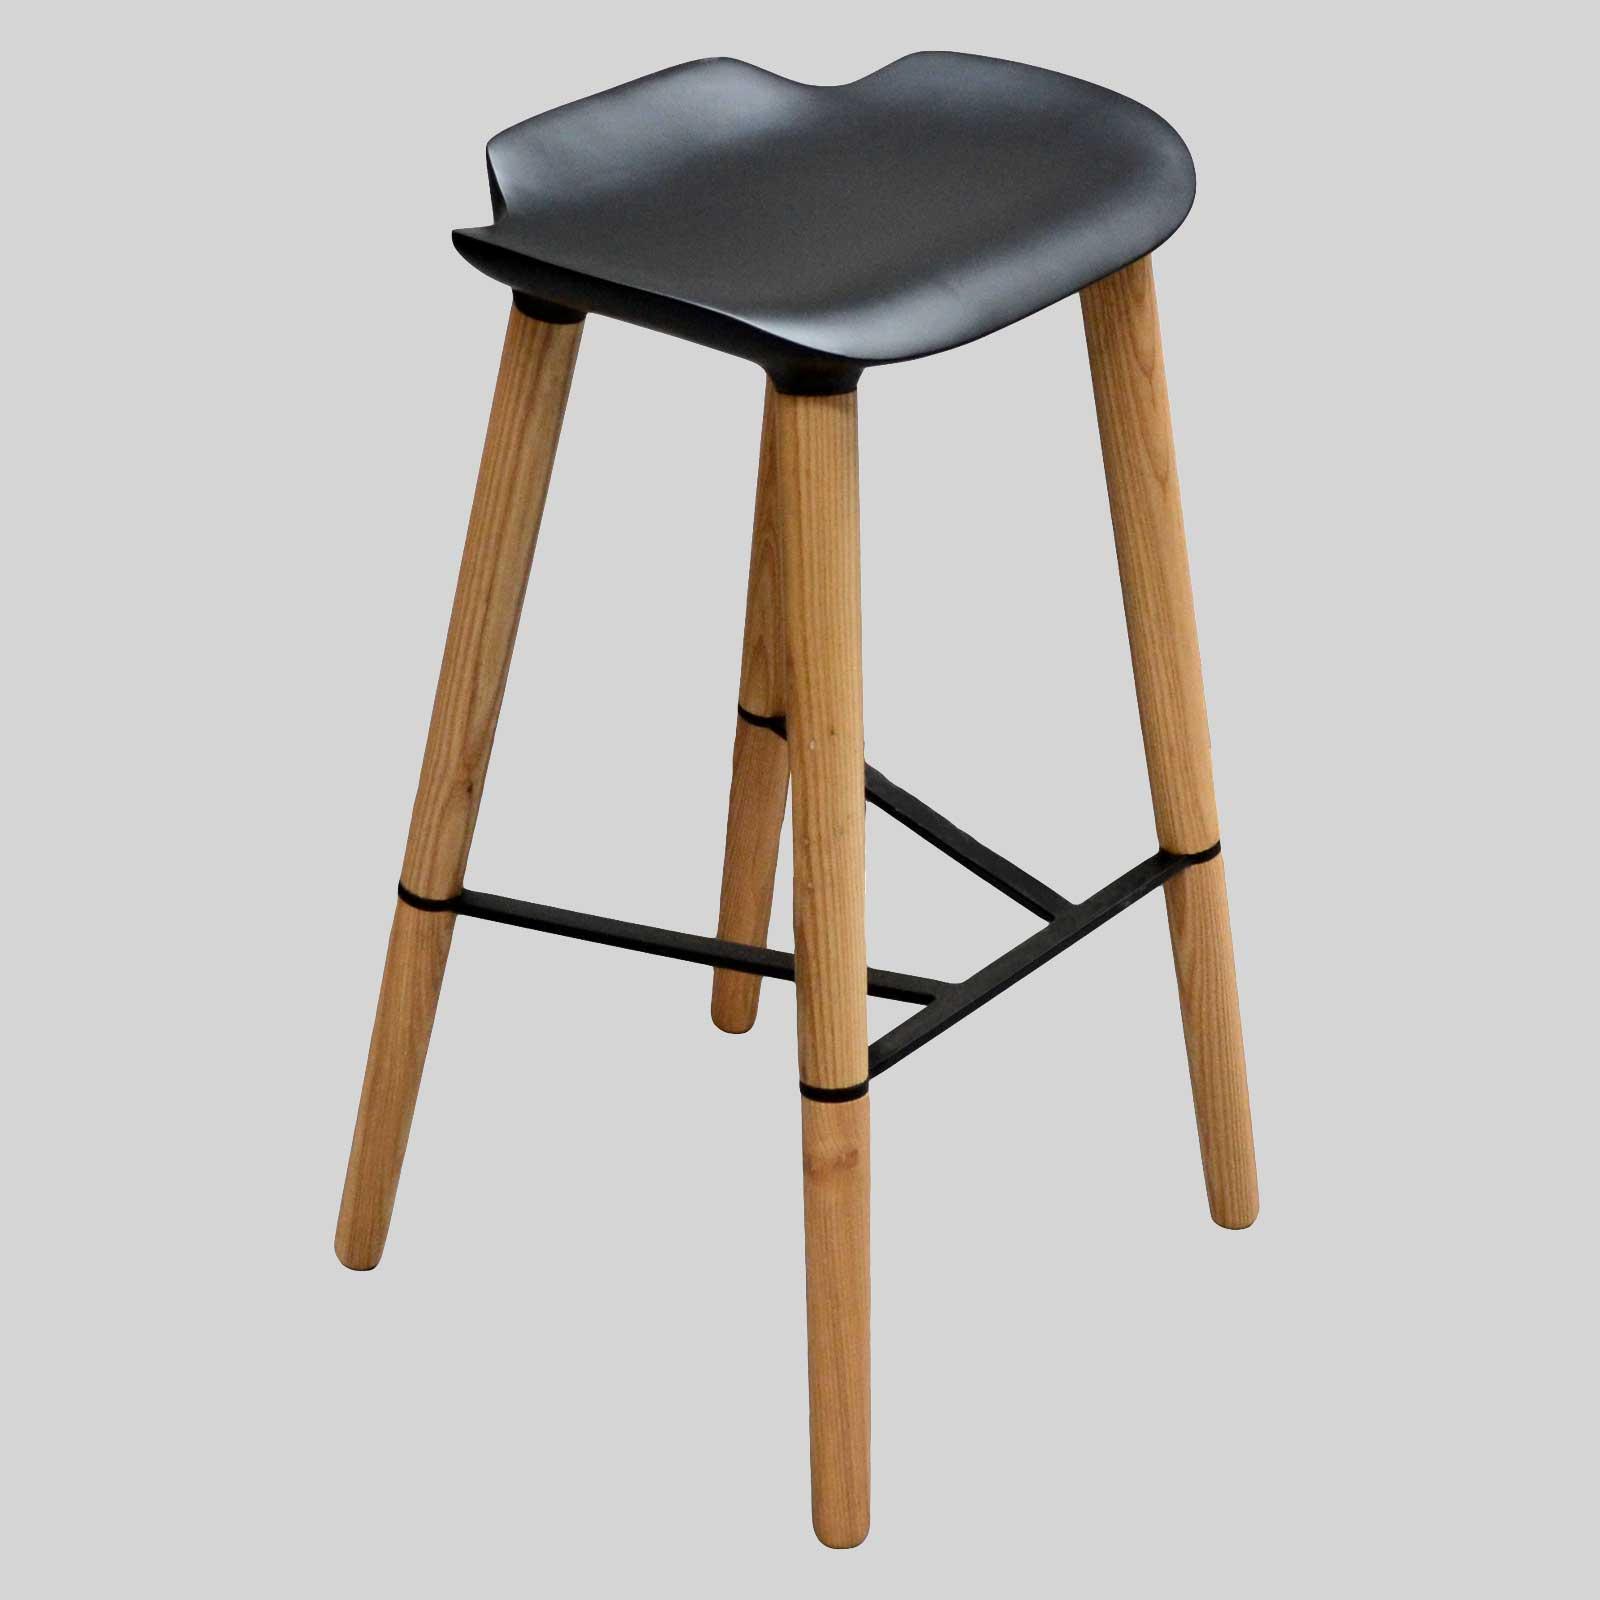 Bar Stool Chair With Wheels 2 Bar Stools Oak Wood Wooden